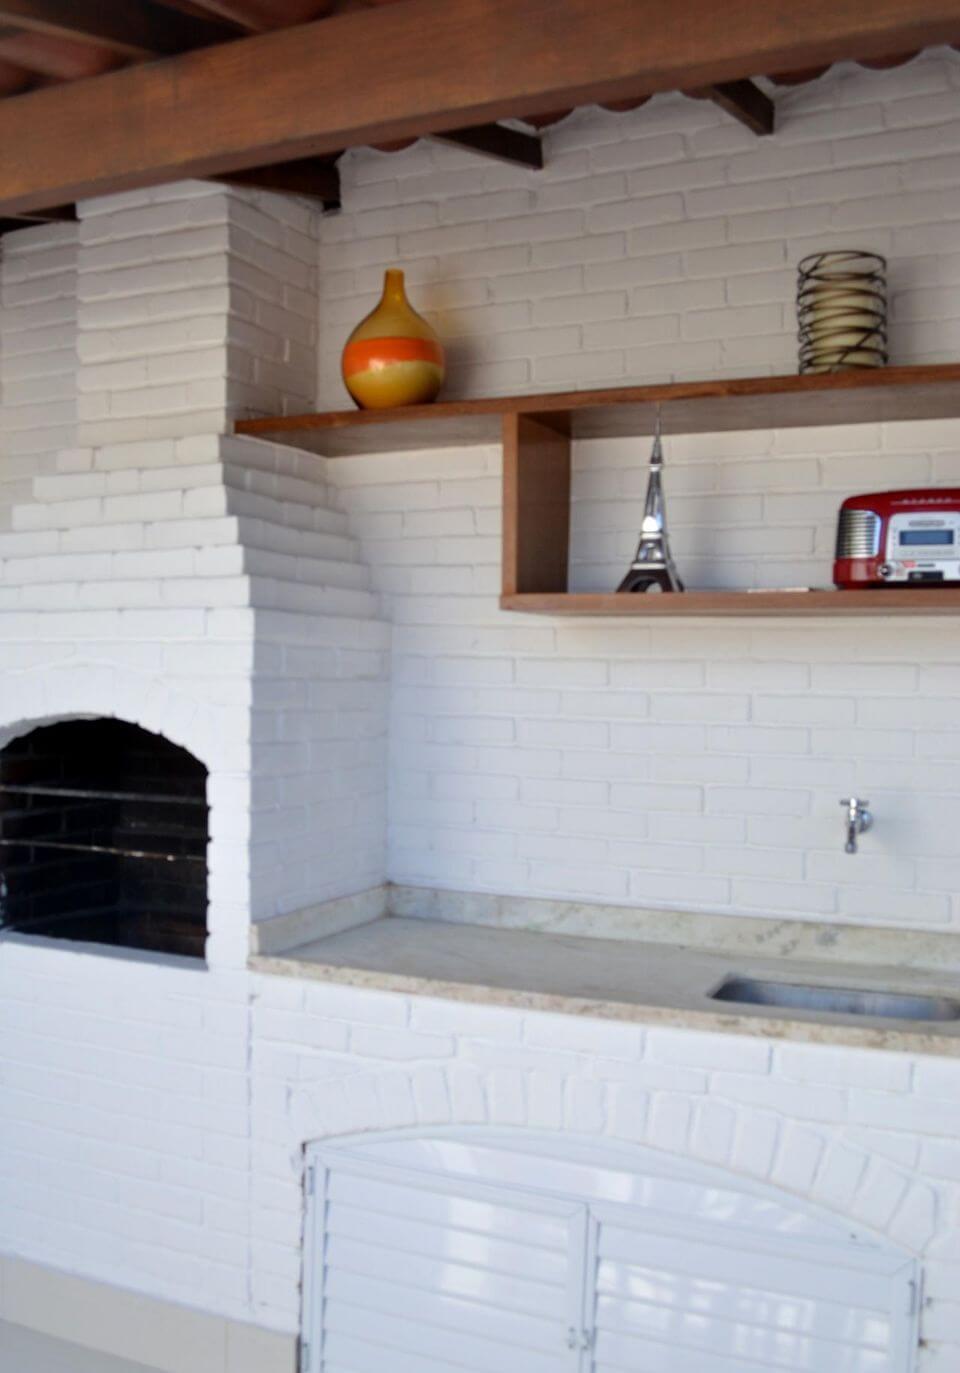 churrasqueira de tijolo - churrasqueira de tijolinhos